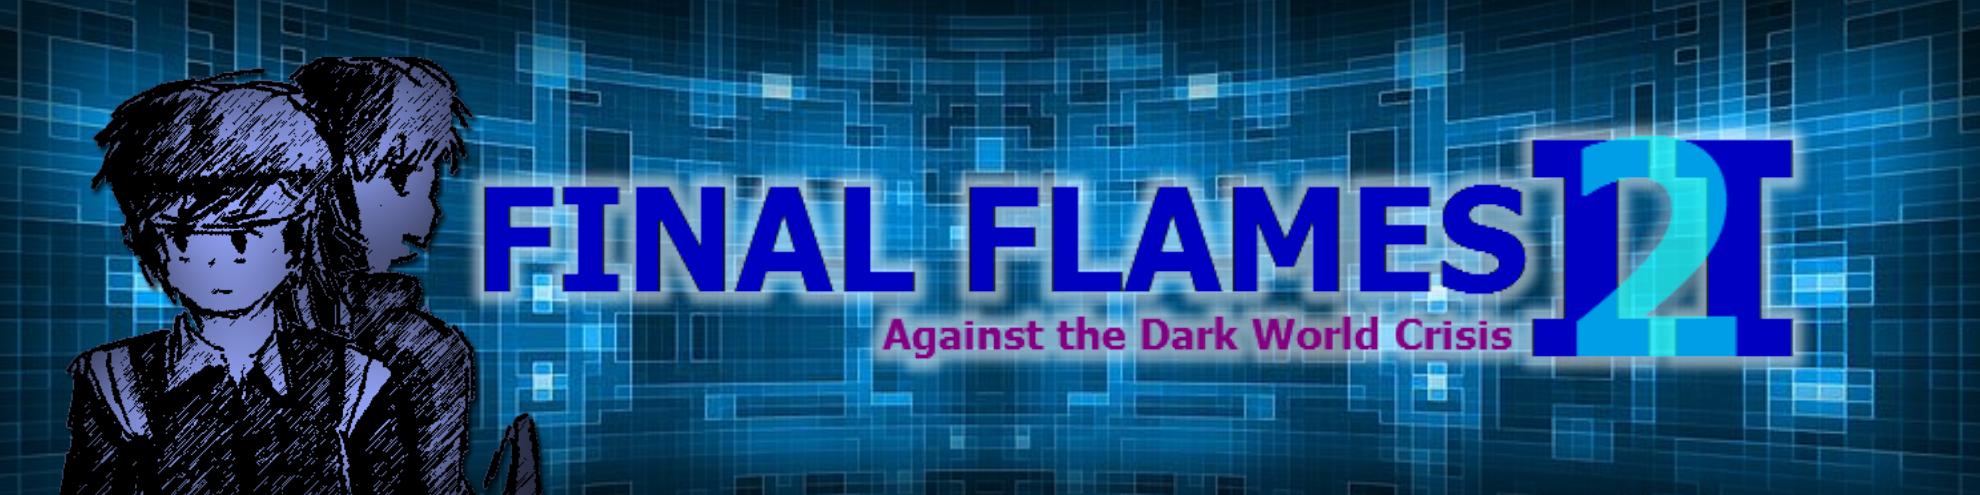 Final Flames 2: Against the Dark World Crisis